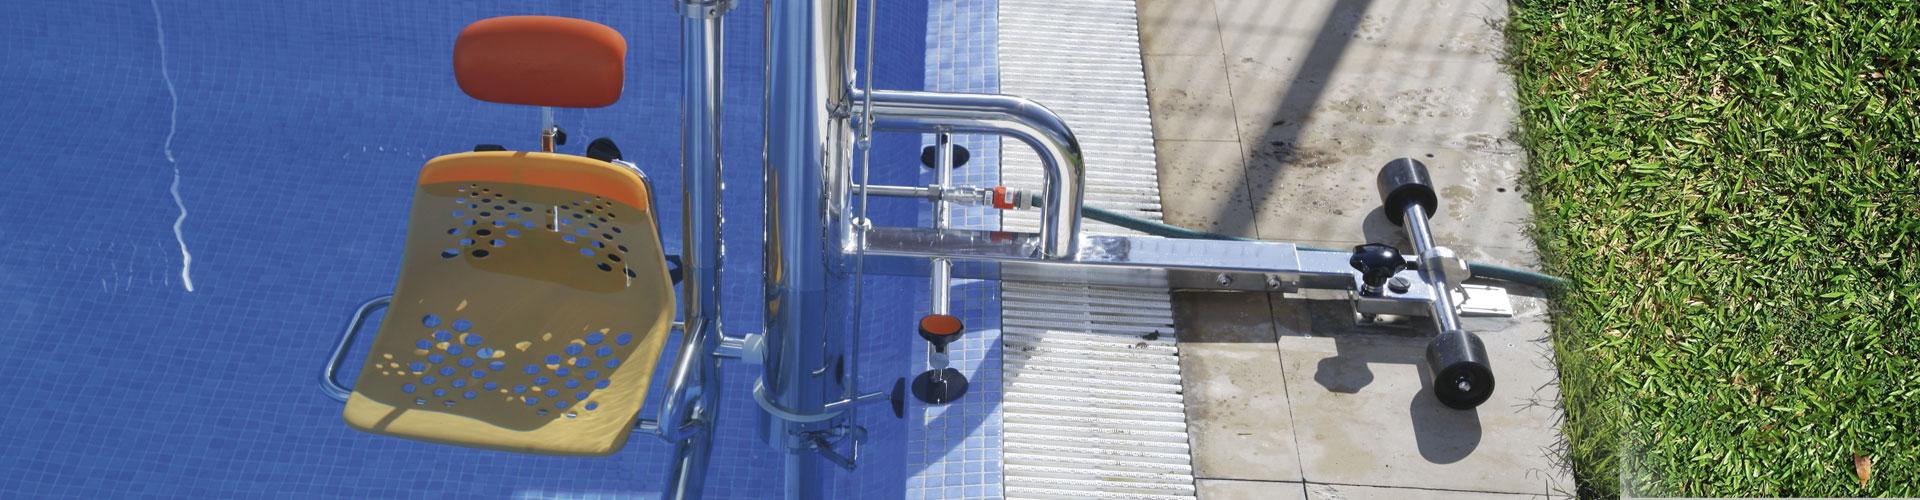 Esquema elevador piscina hidraulico Access b2